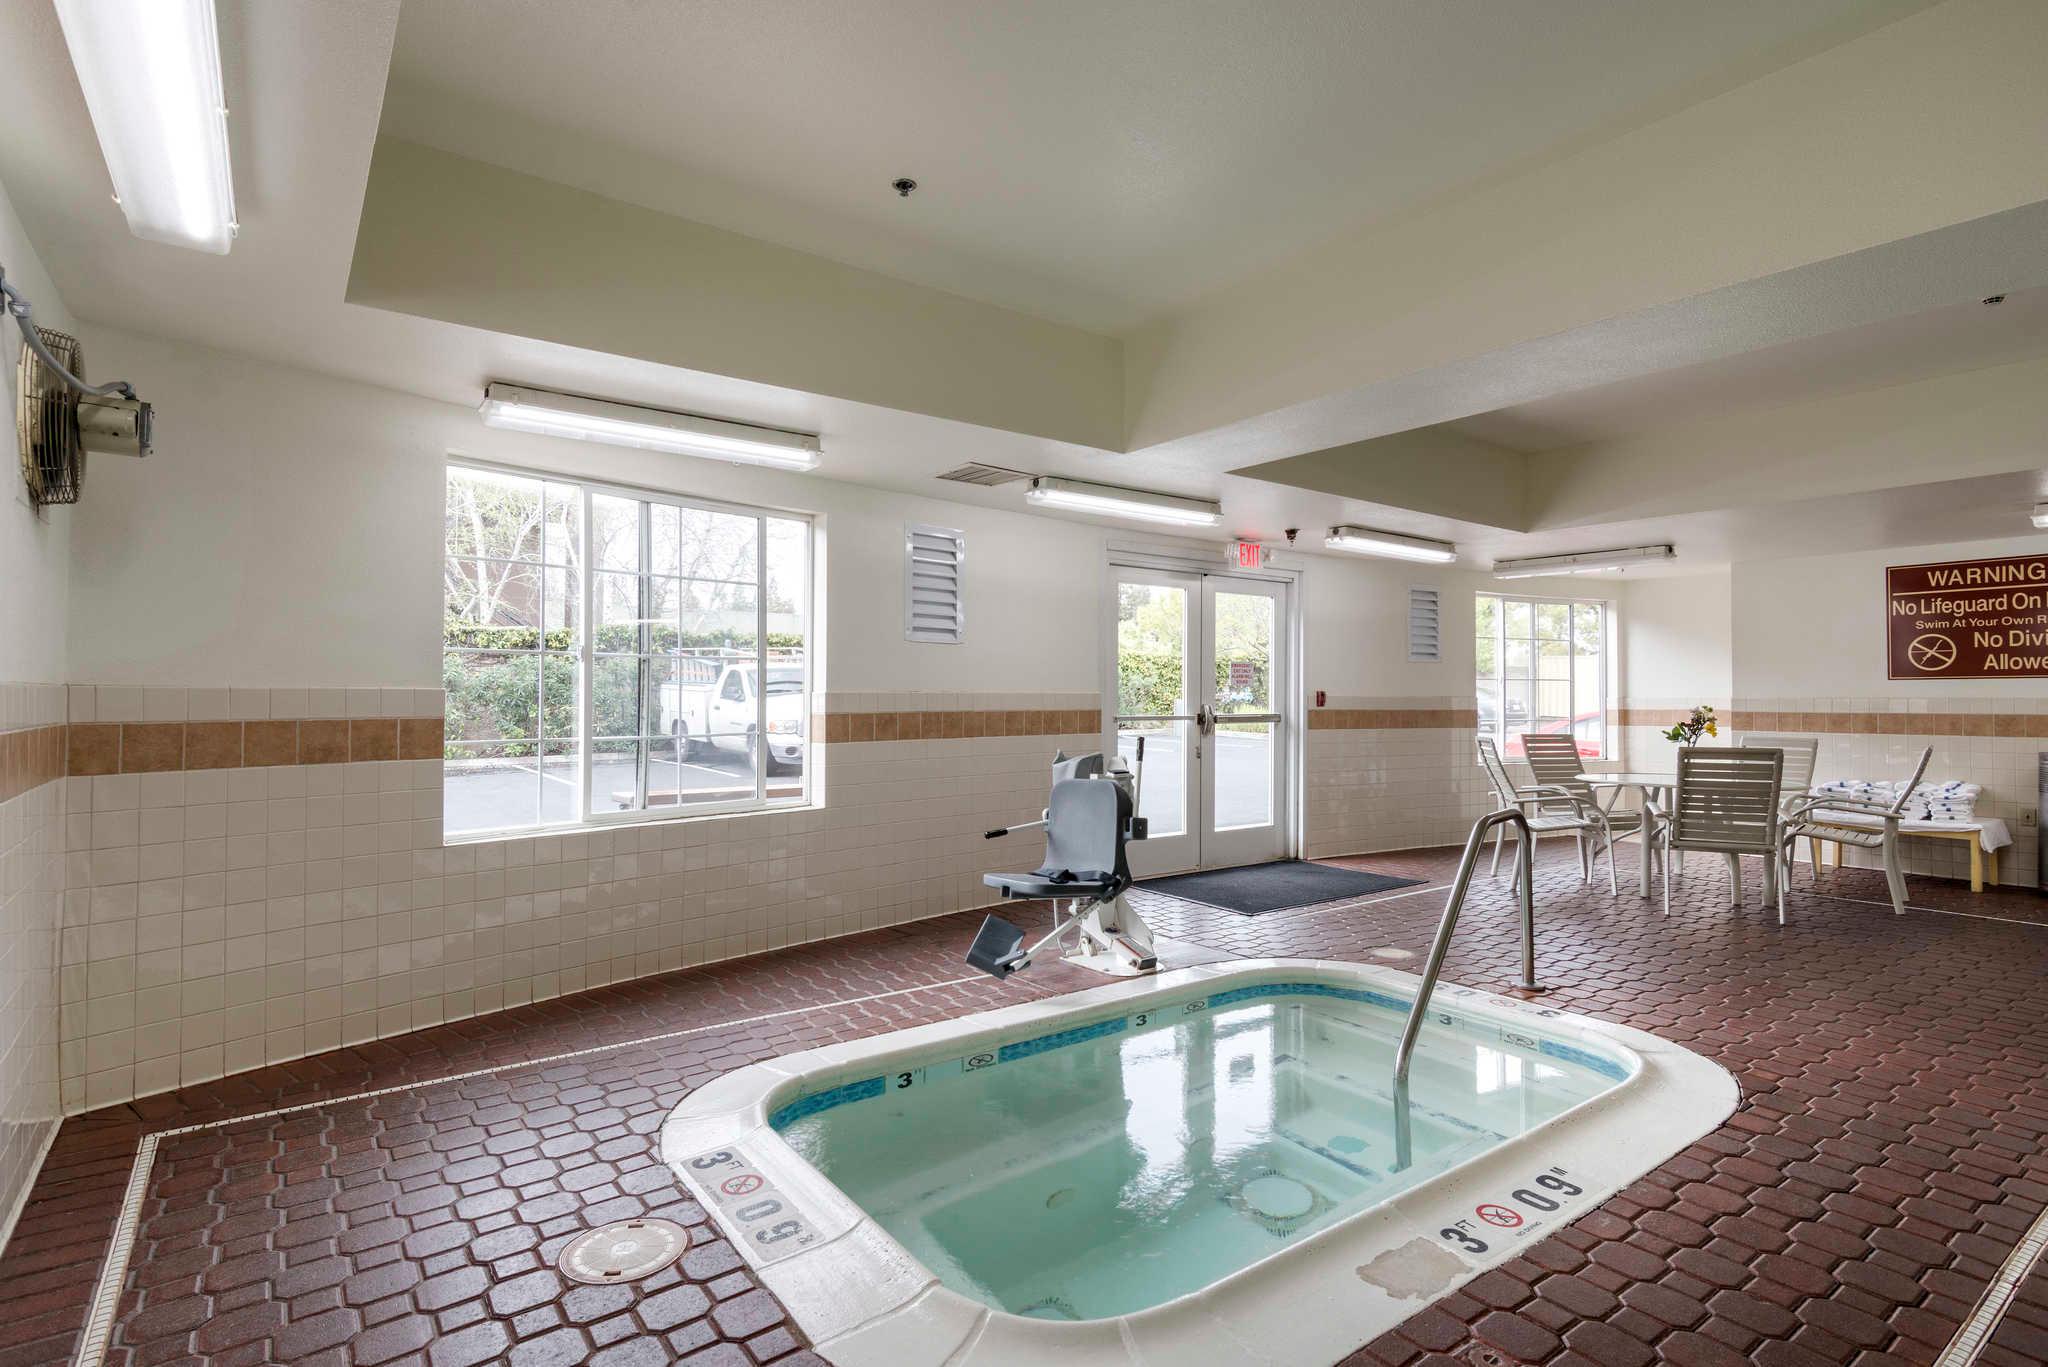 Comfort Inn & Suites Sacramento - University Area image 31